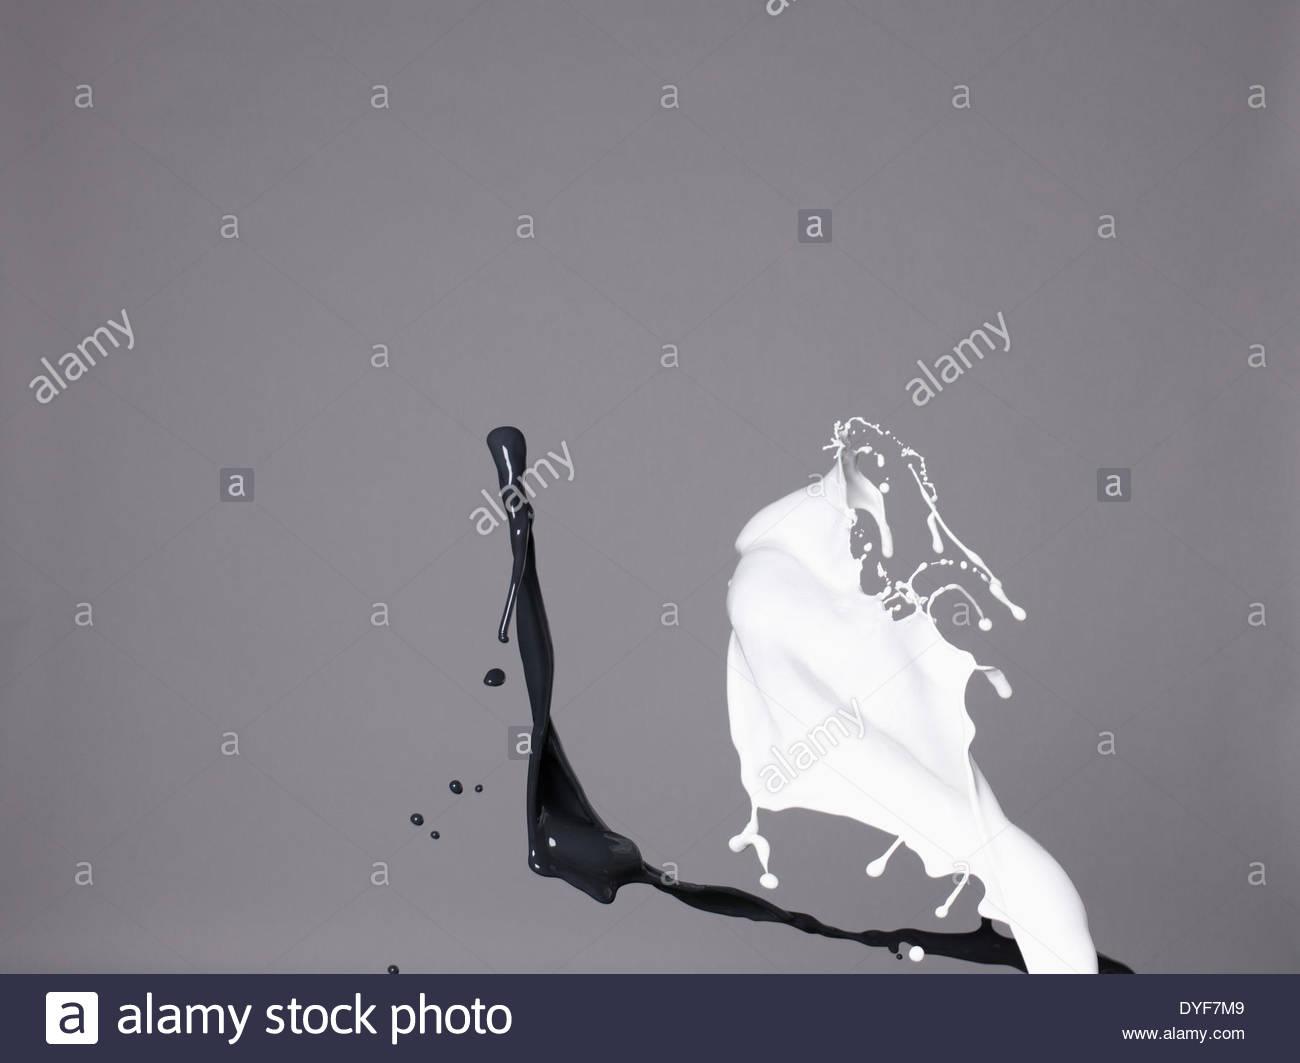 Black and white liquids splashing - Stock Image